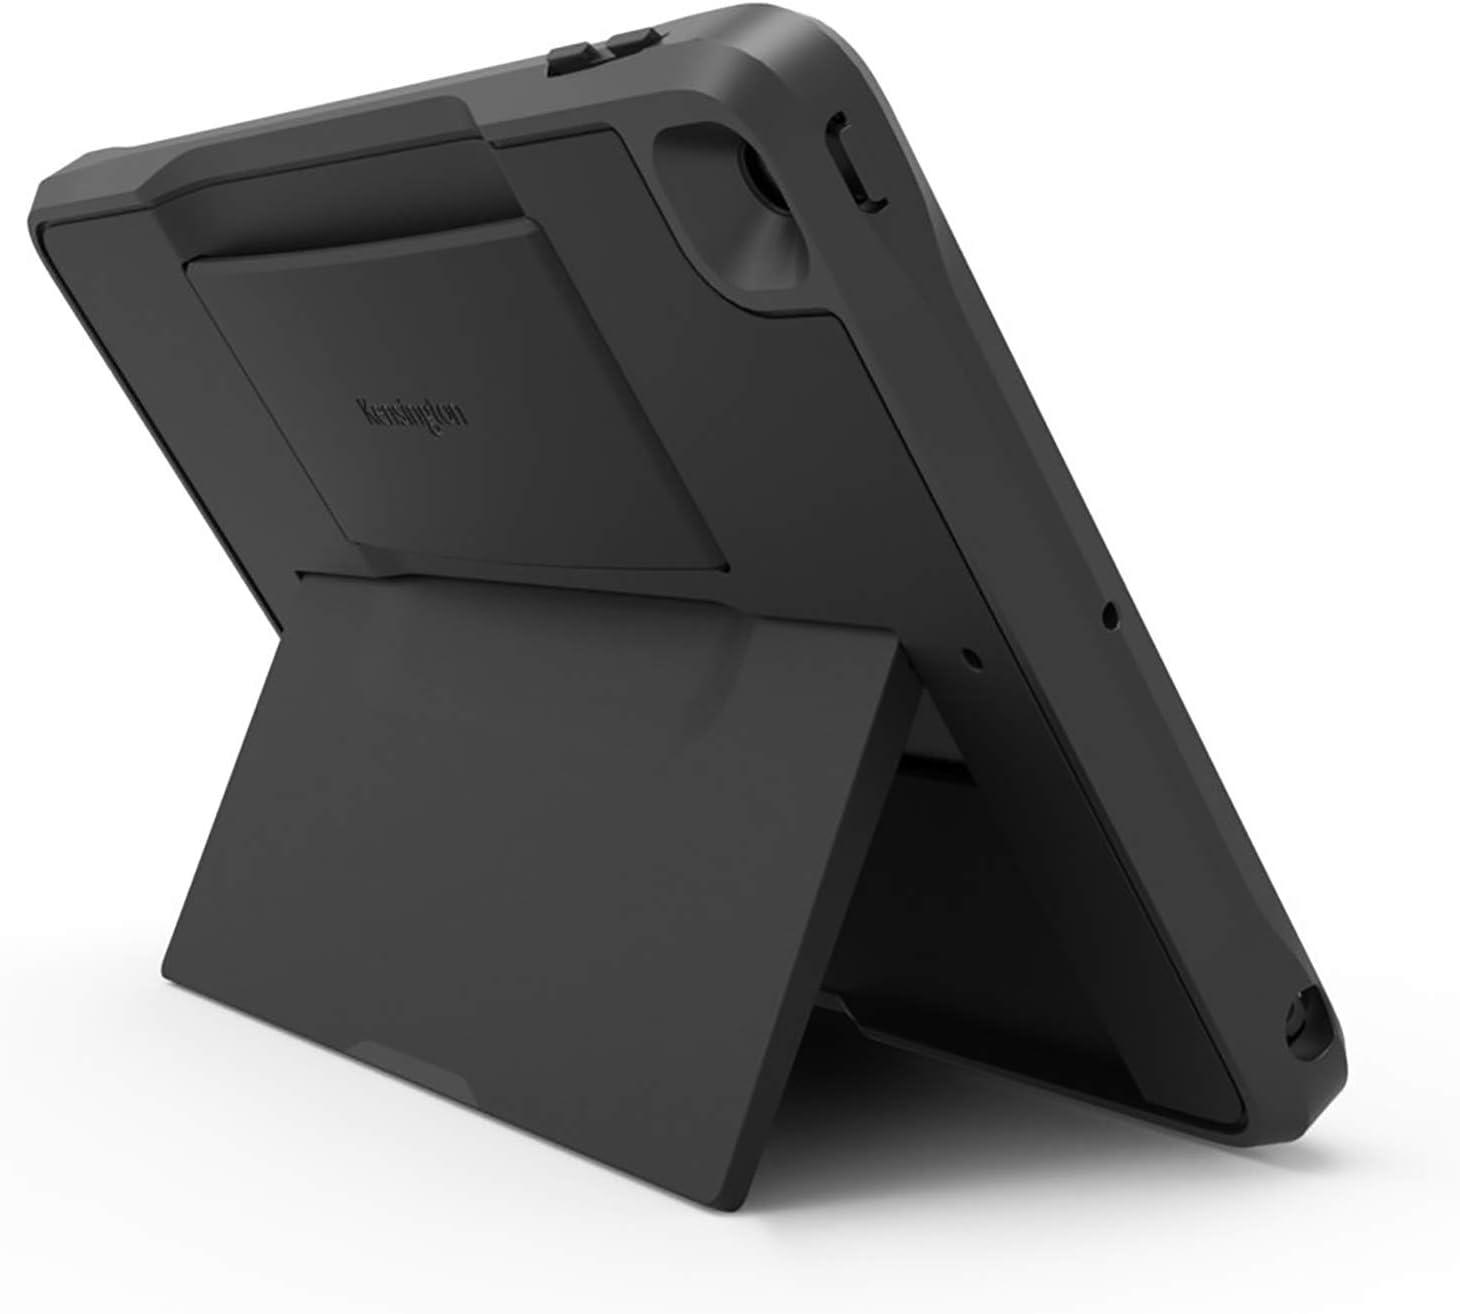 Kensington Blackbelt 2nd Degree Rugged Case for iPad 9.7'' 2017 & 2018 (K97452WW)